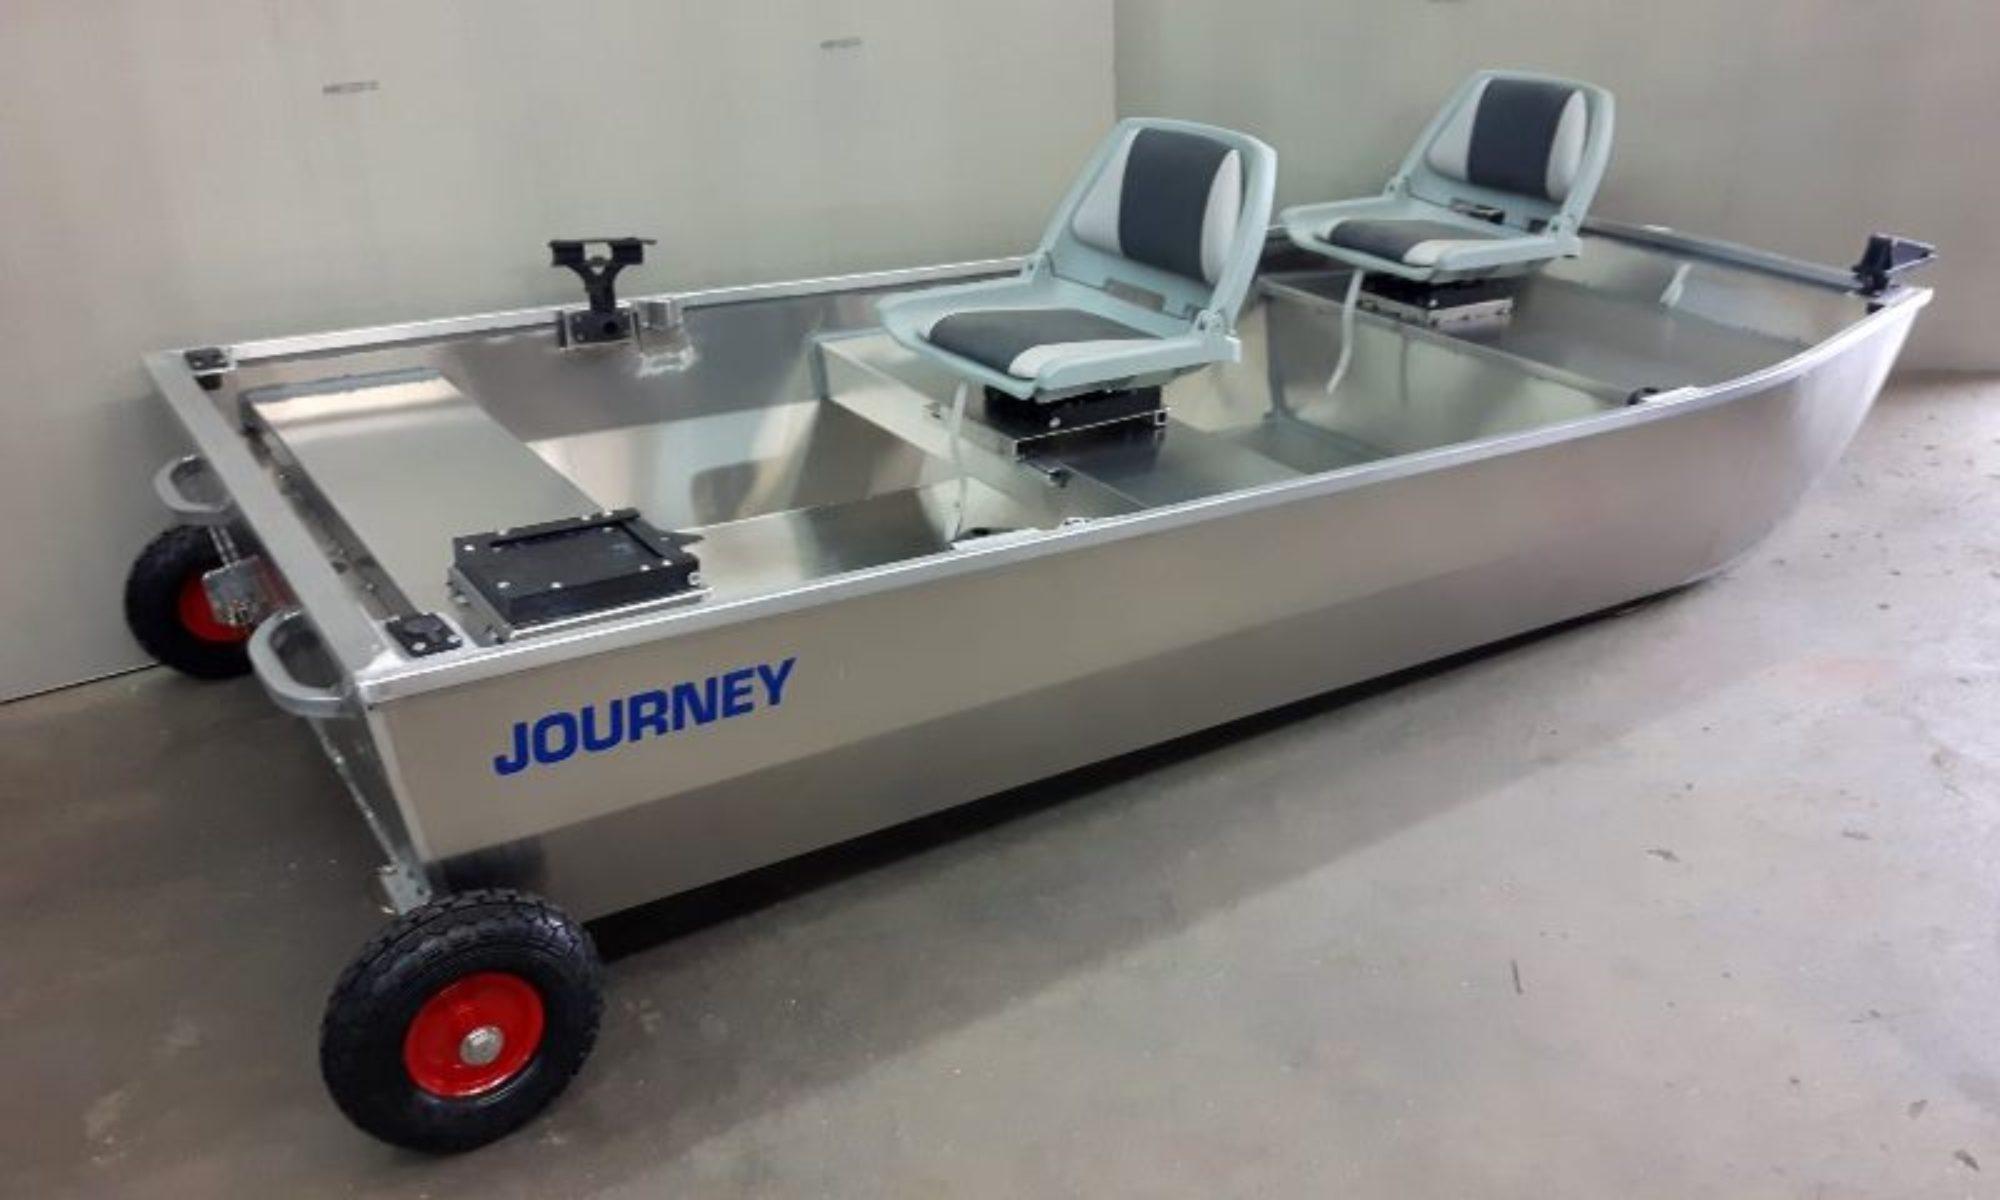 journeyboats.ca